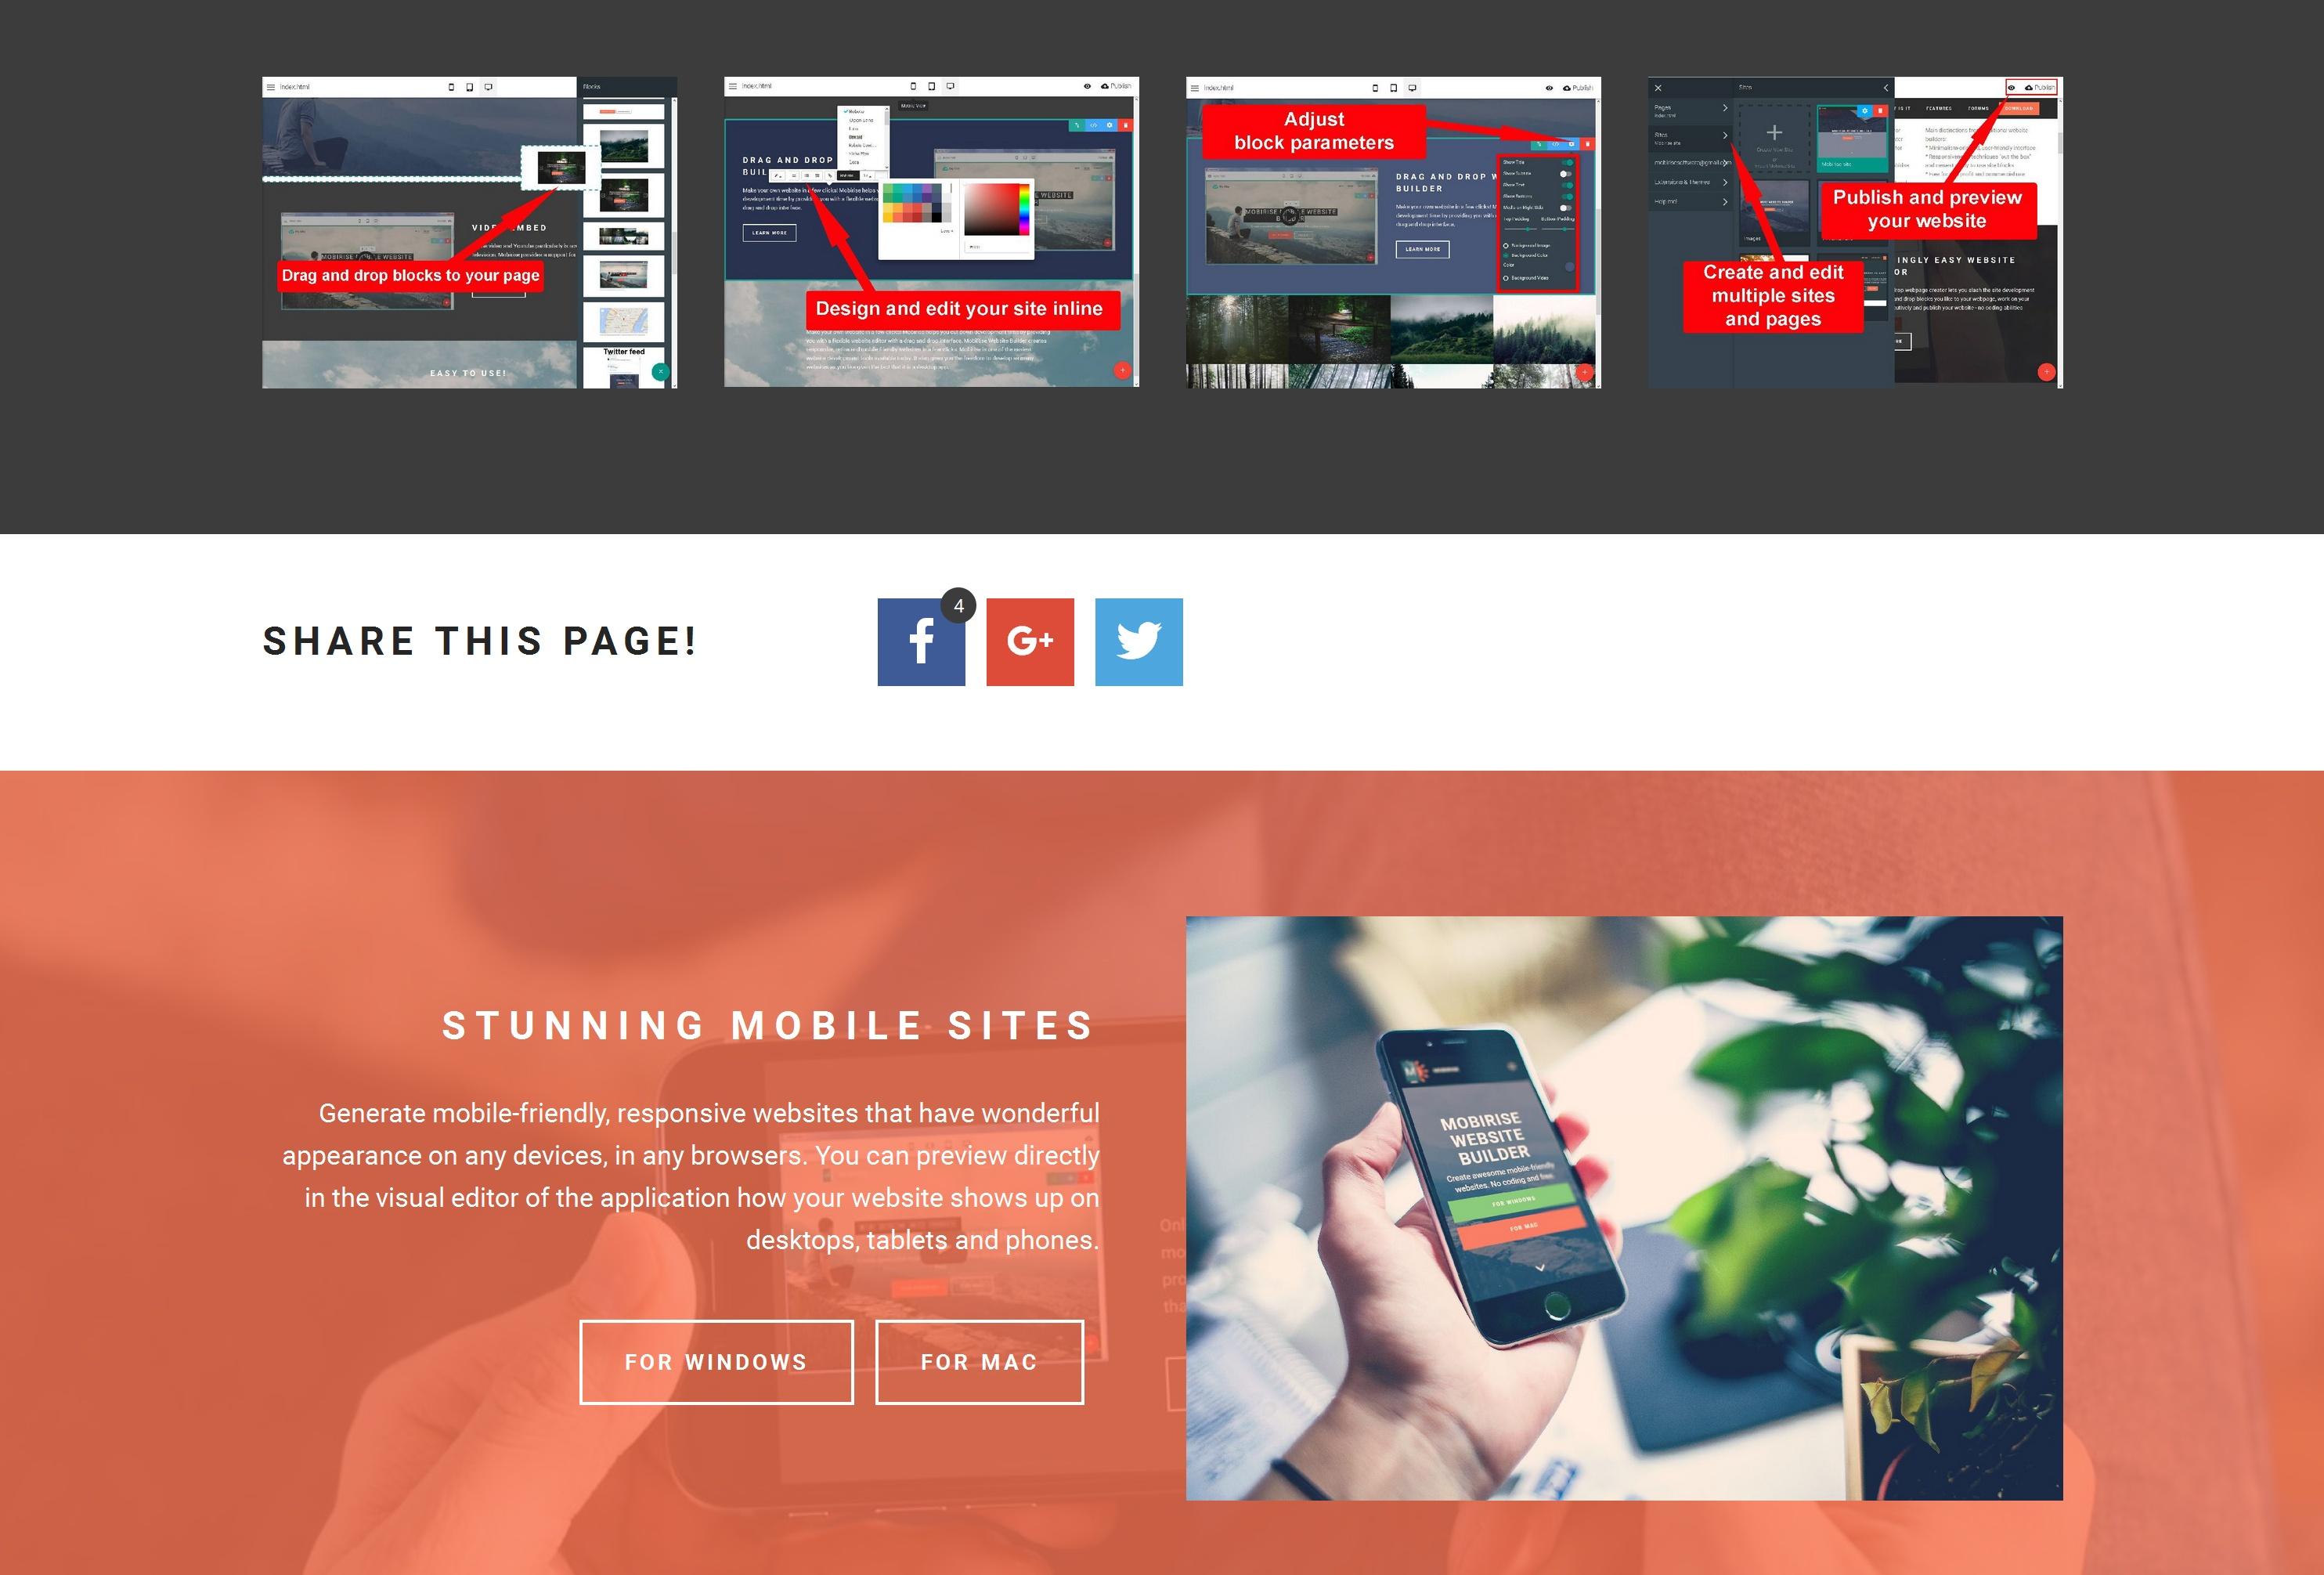 Fast and Simple Website Creator Tool